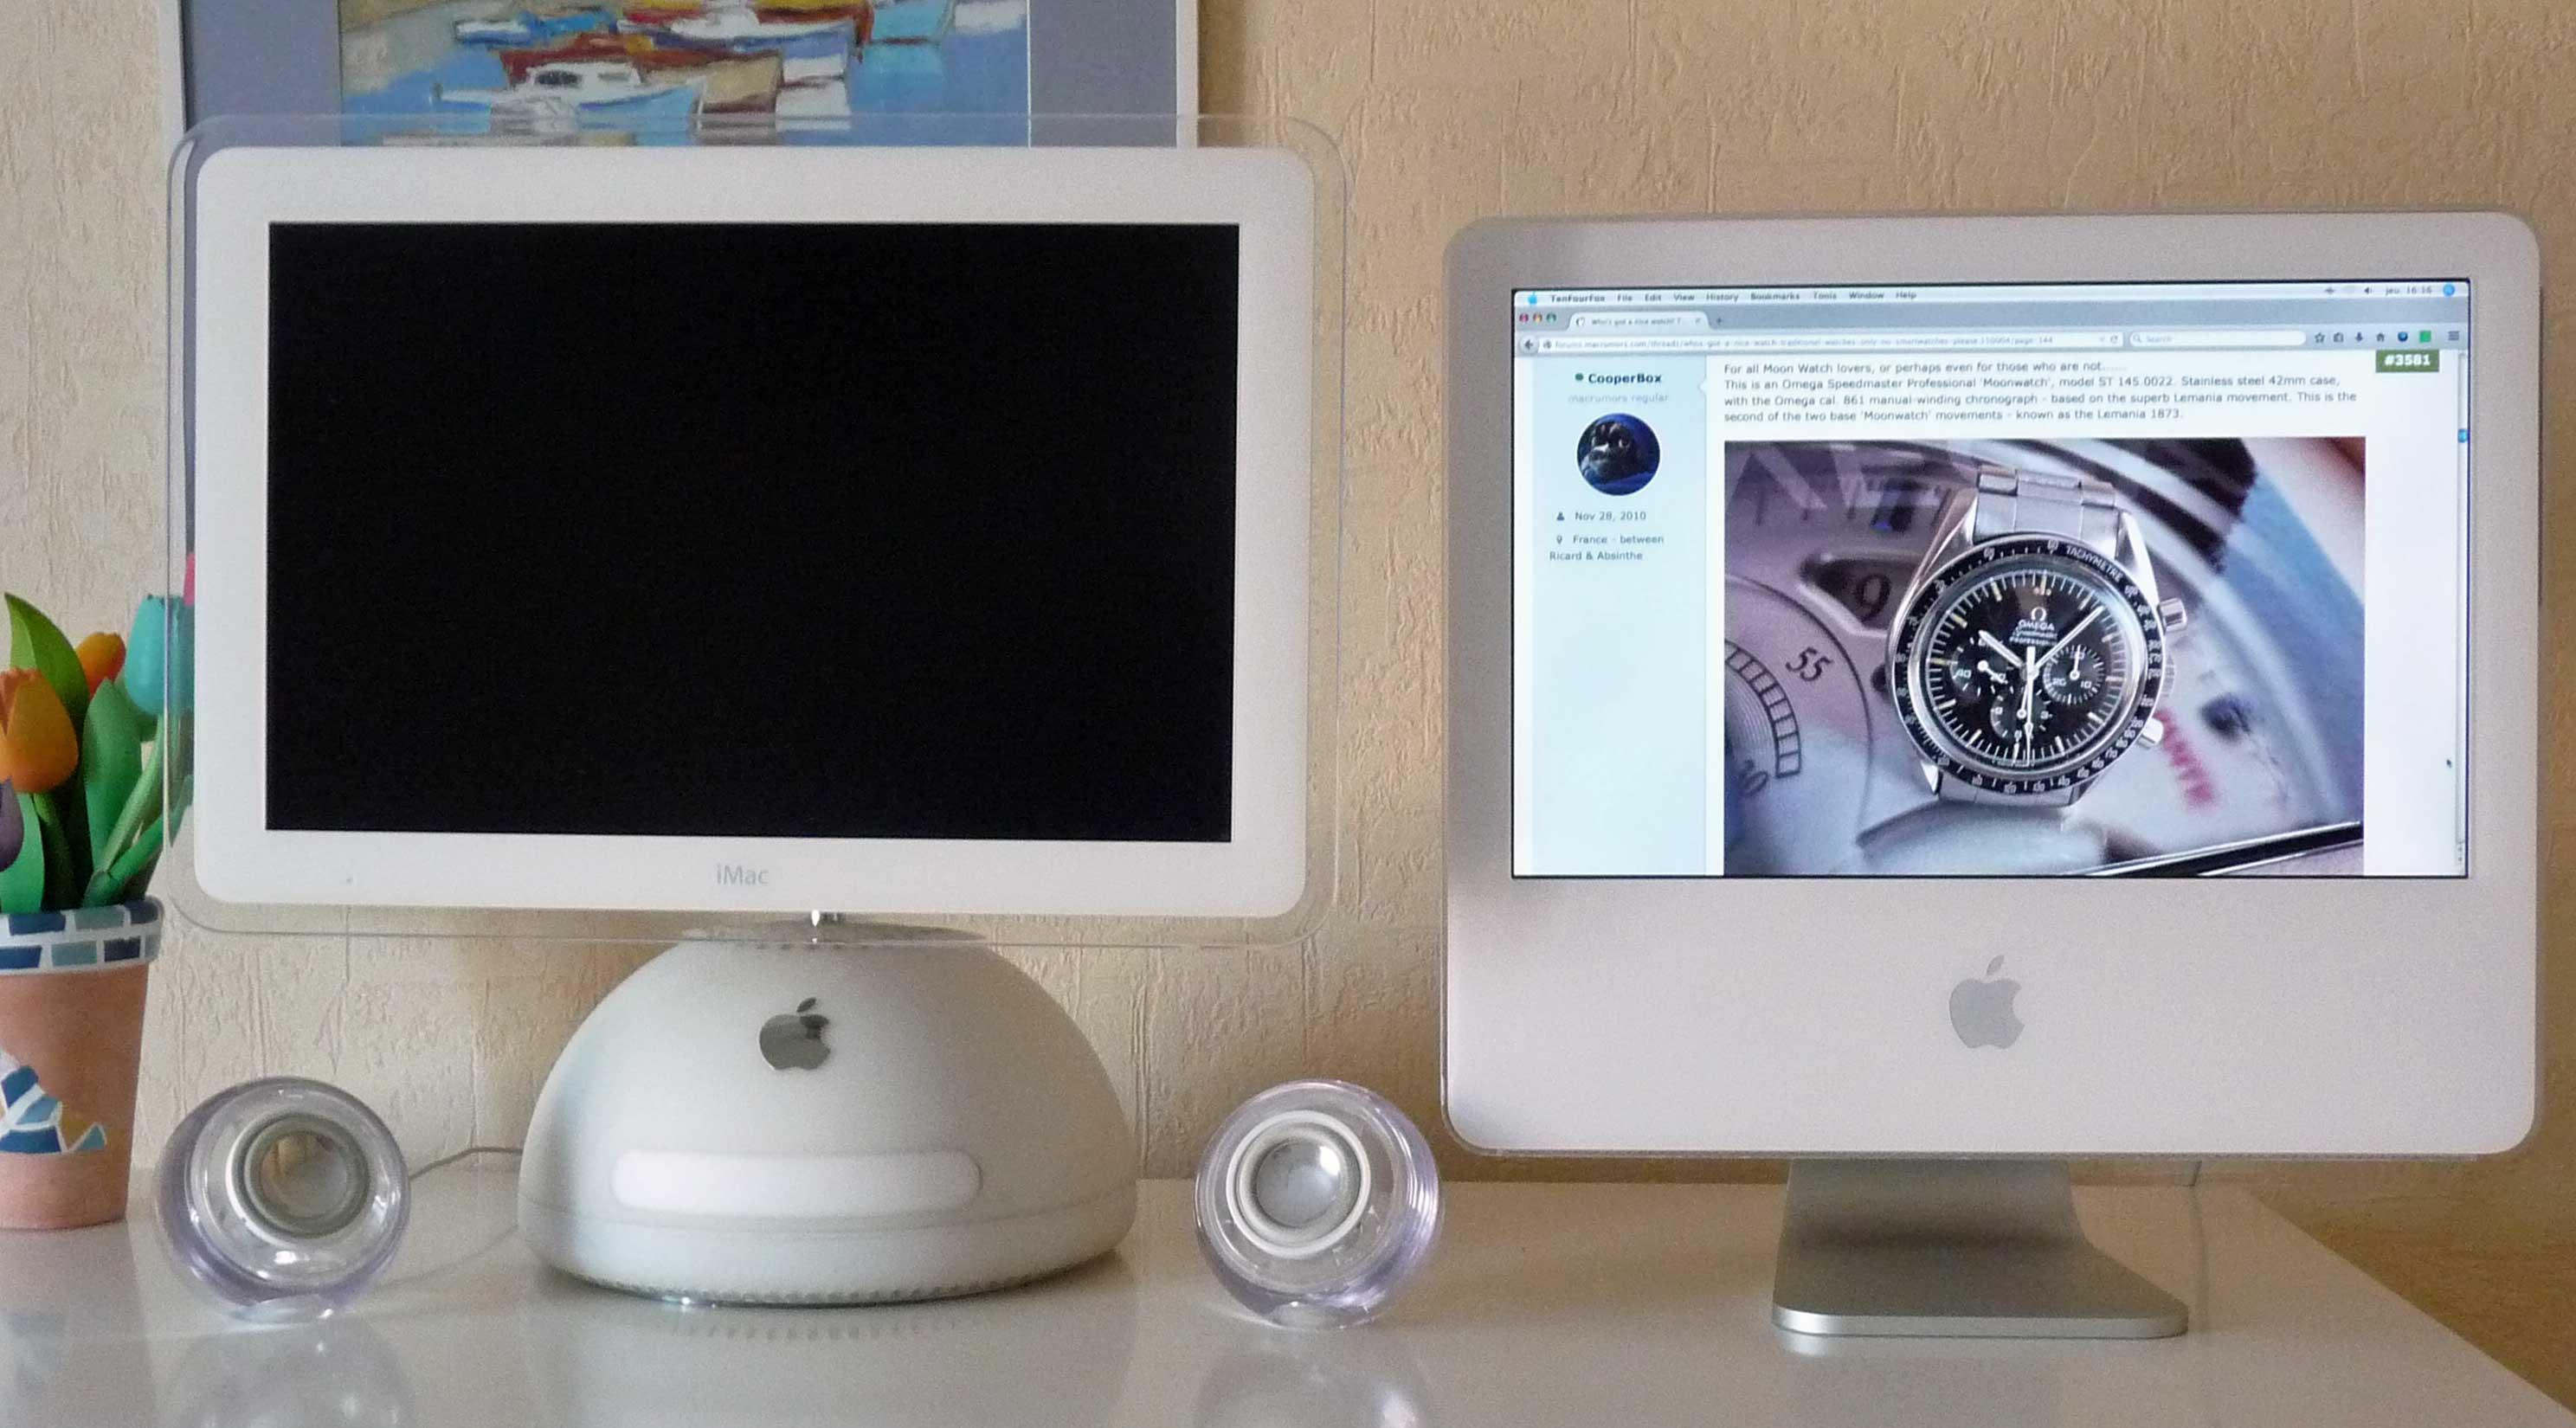 G5iMac-completed.jpg